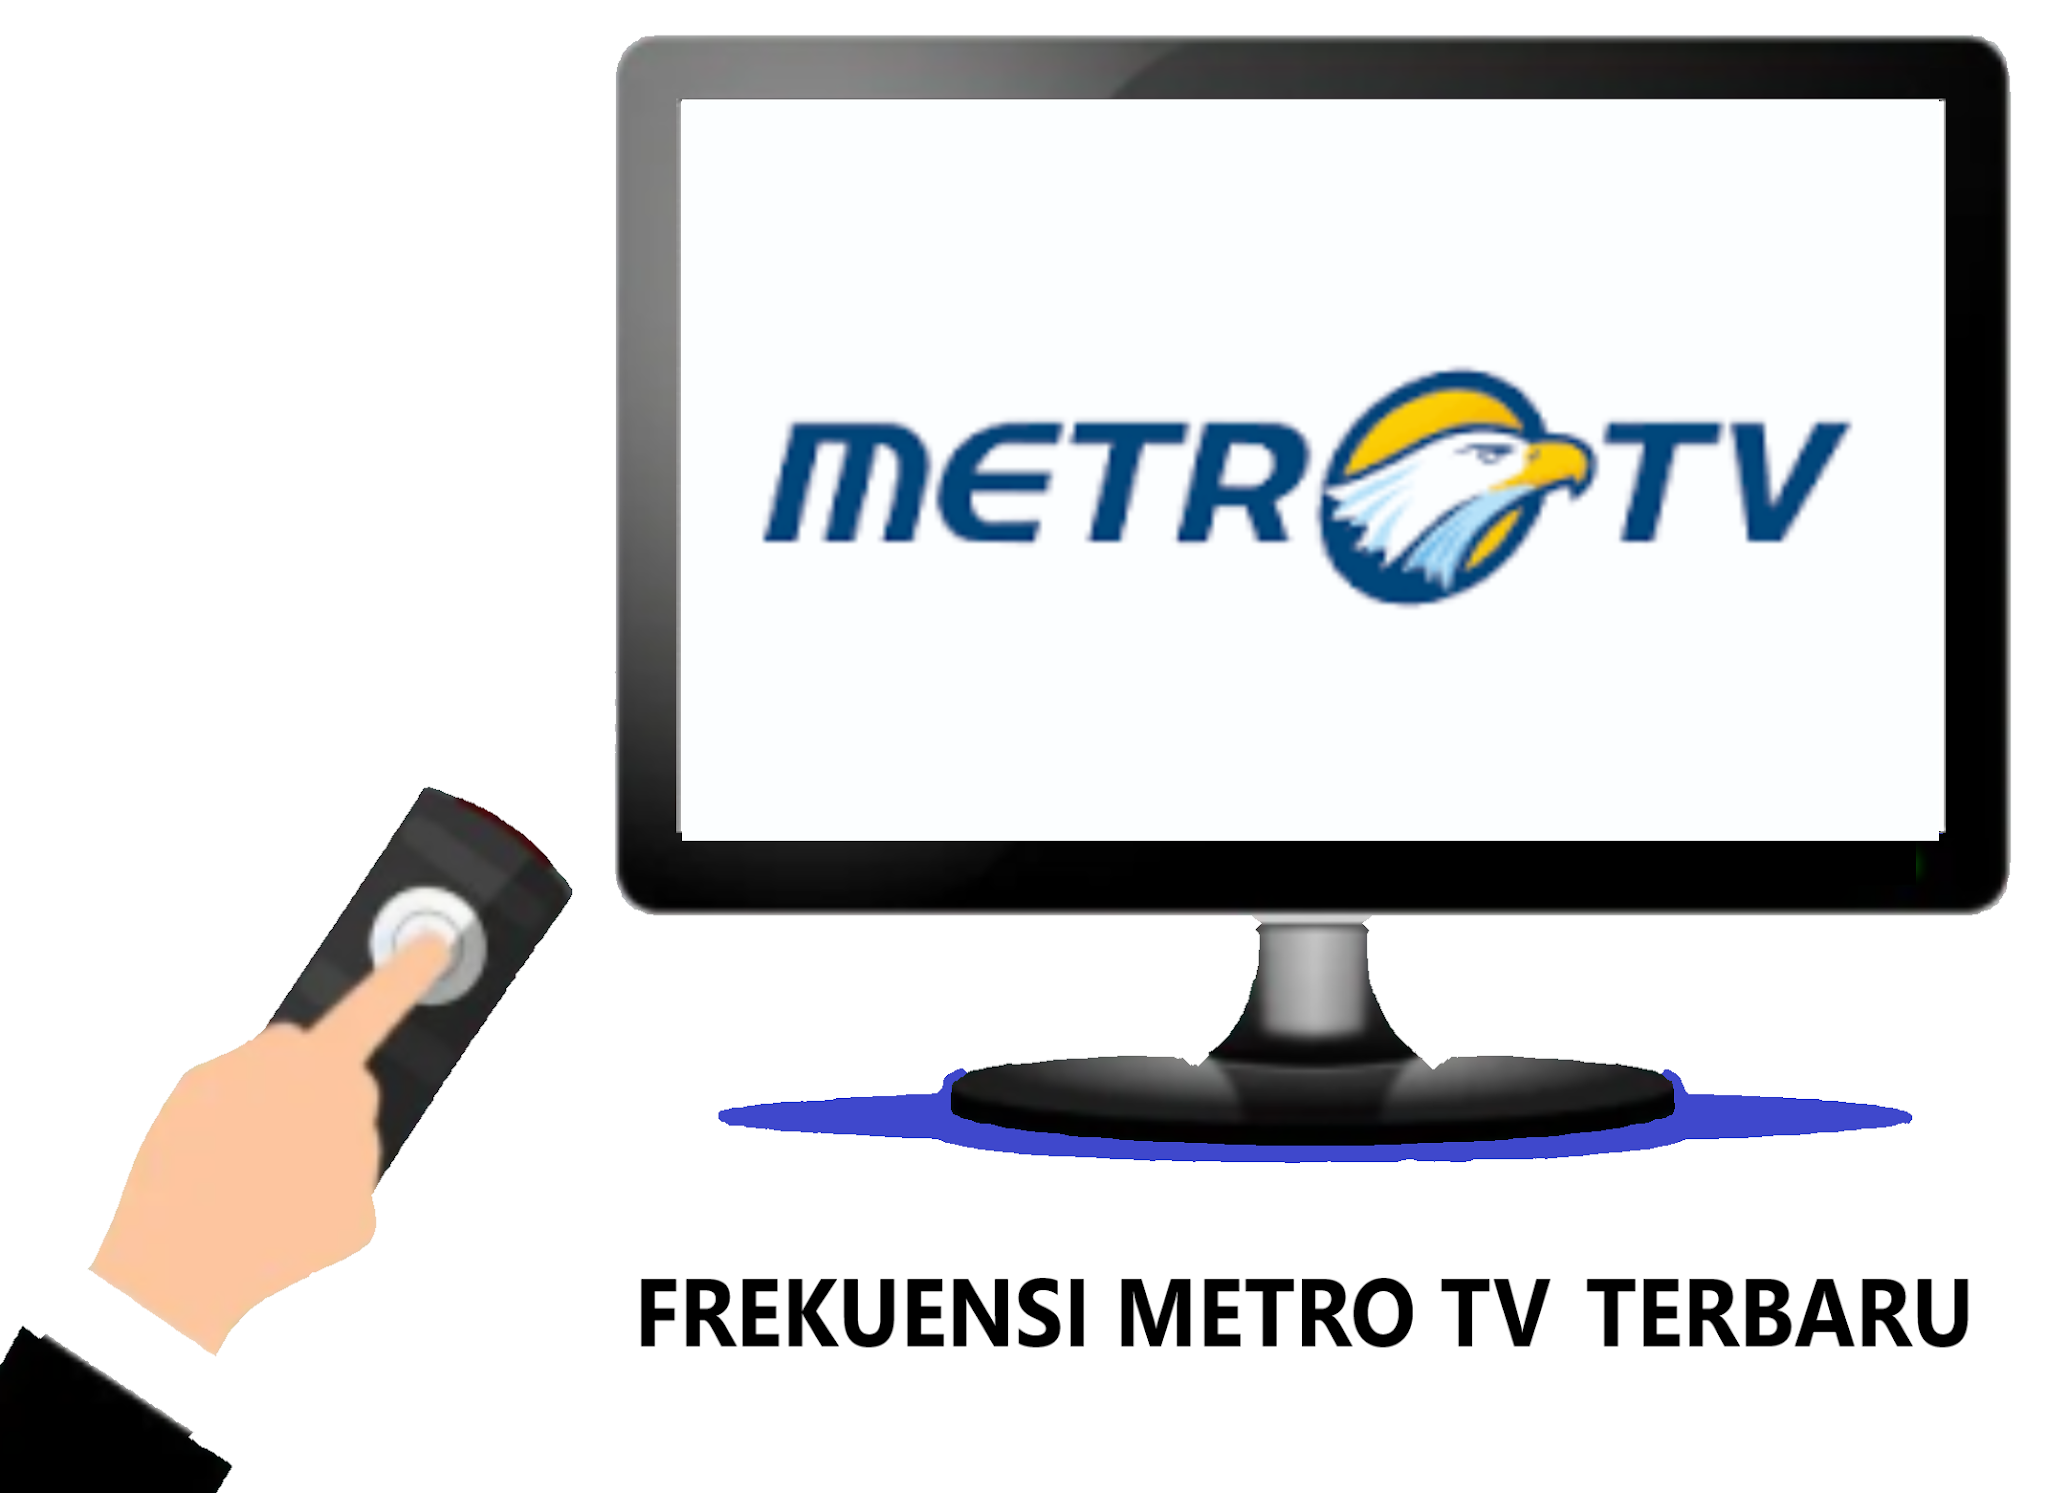 Frekuensi Metro TV Terbaru Di Telkom 4 Update 2020